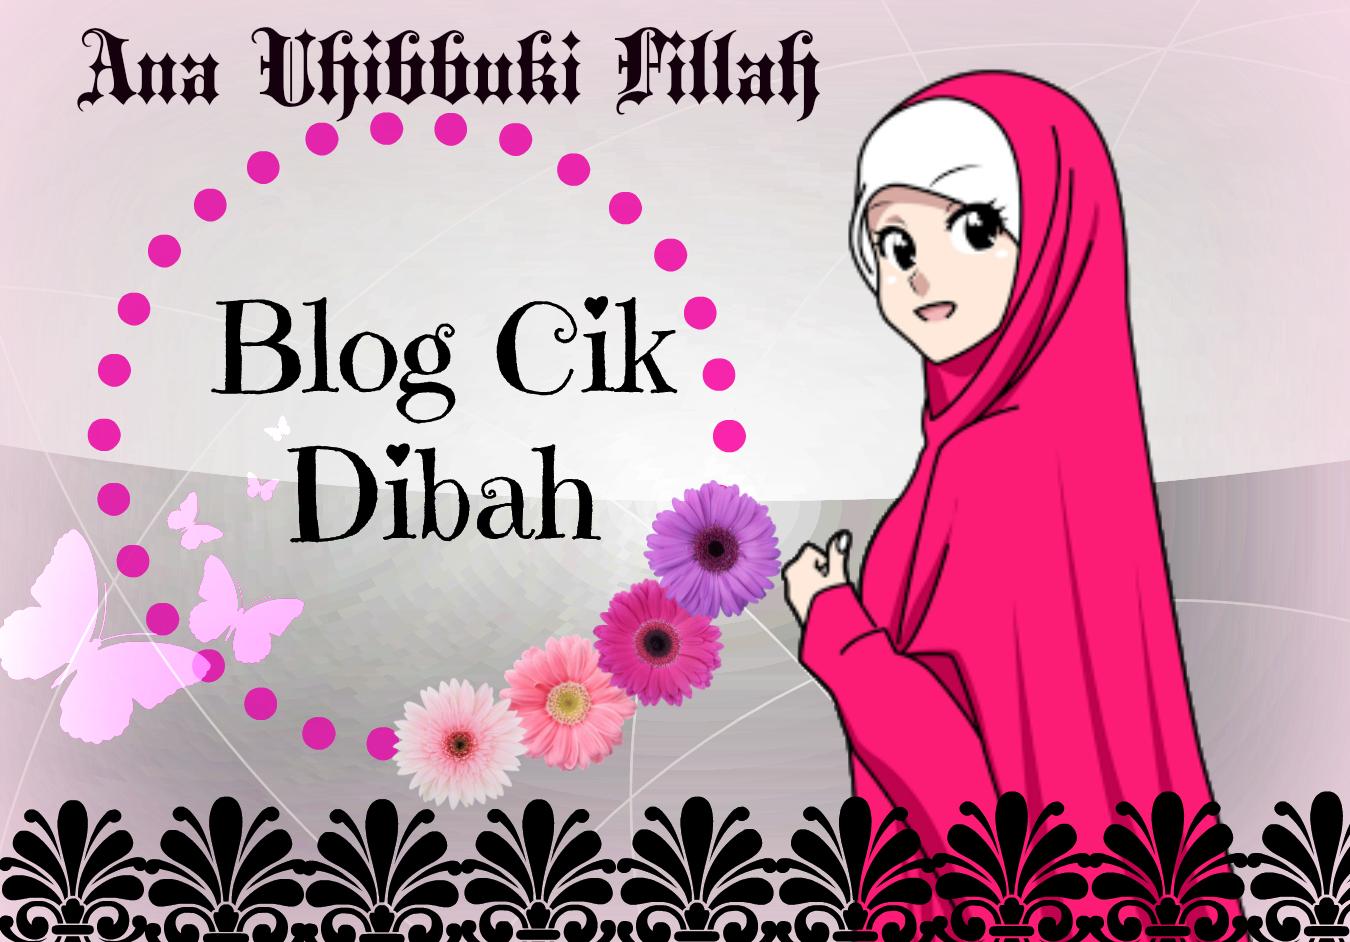 Blog Cik Dibah